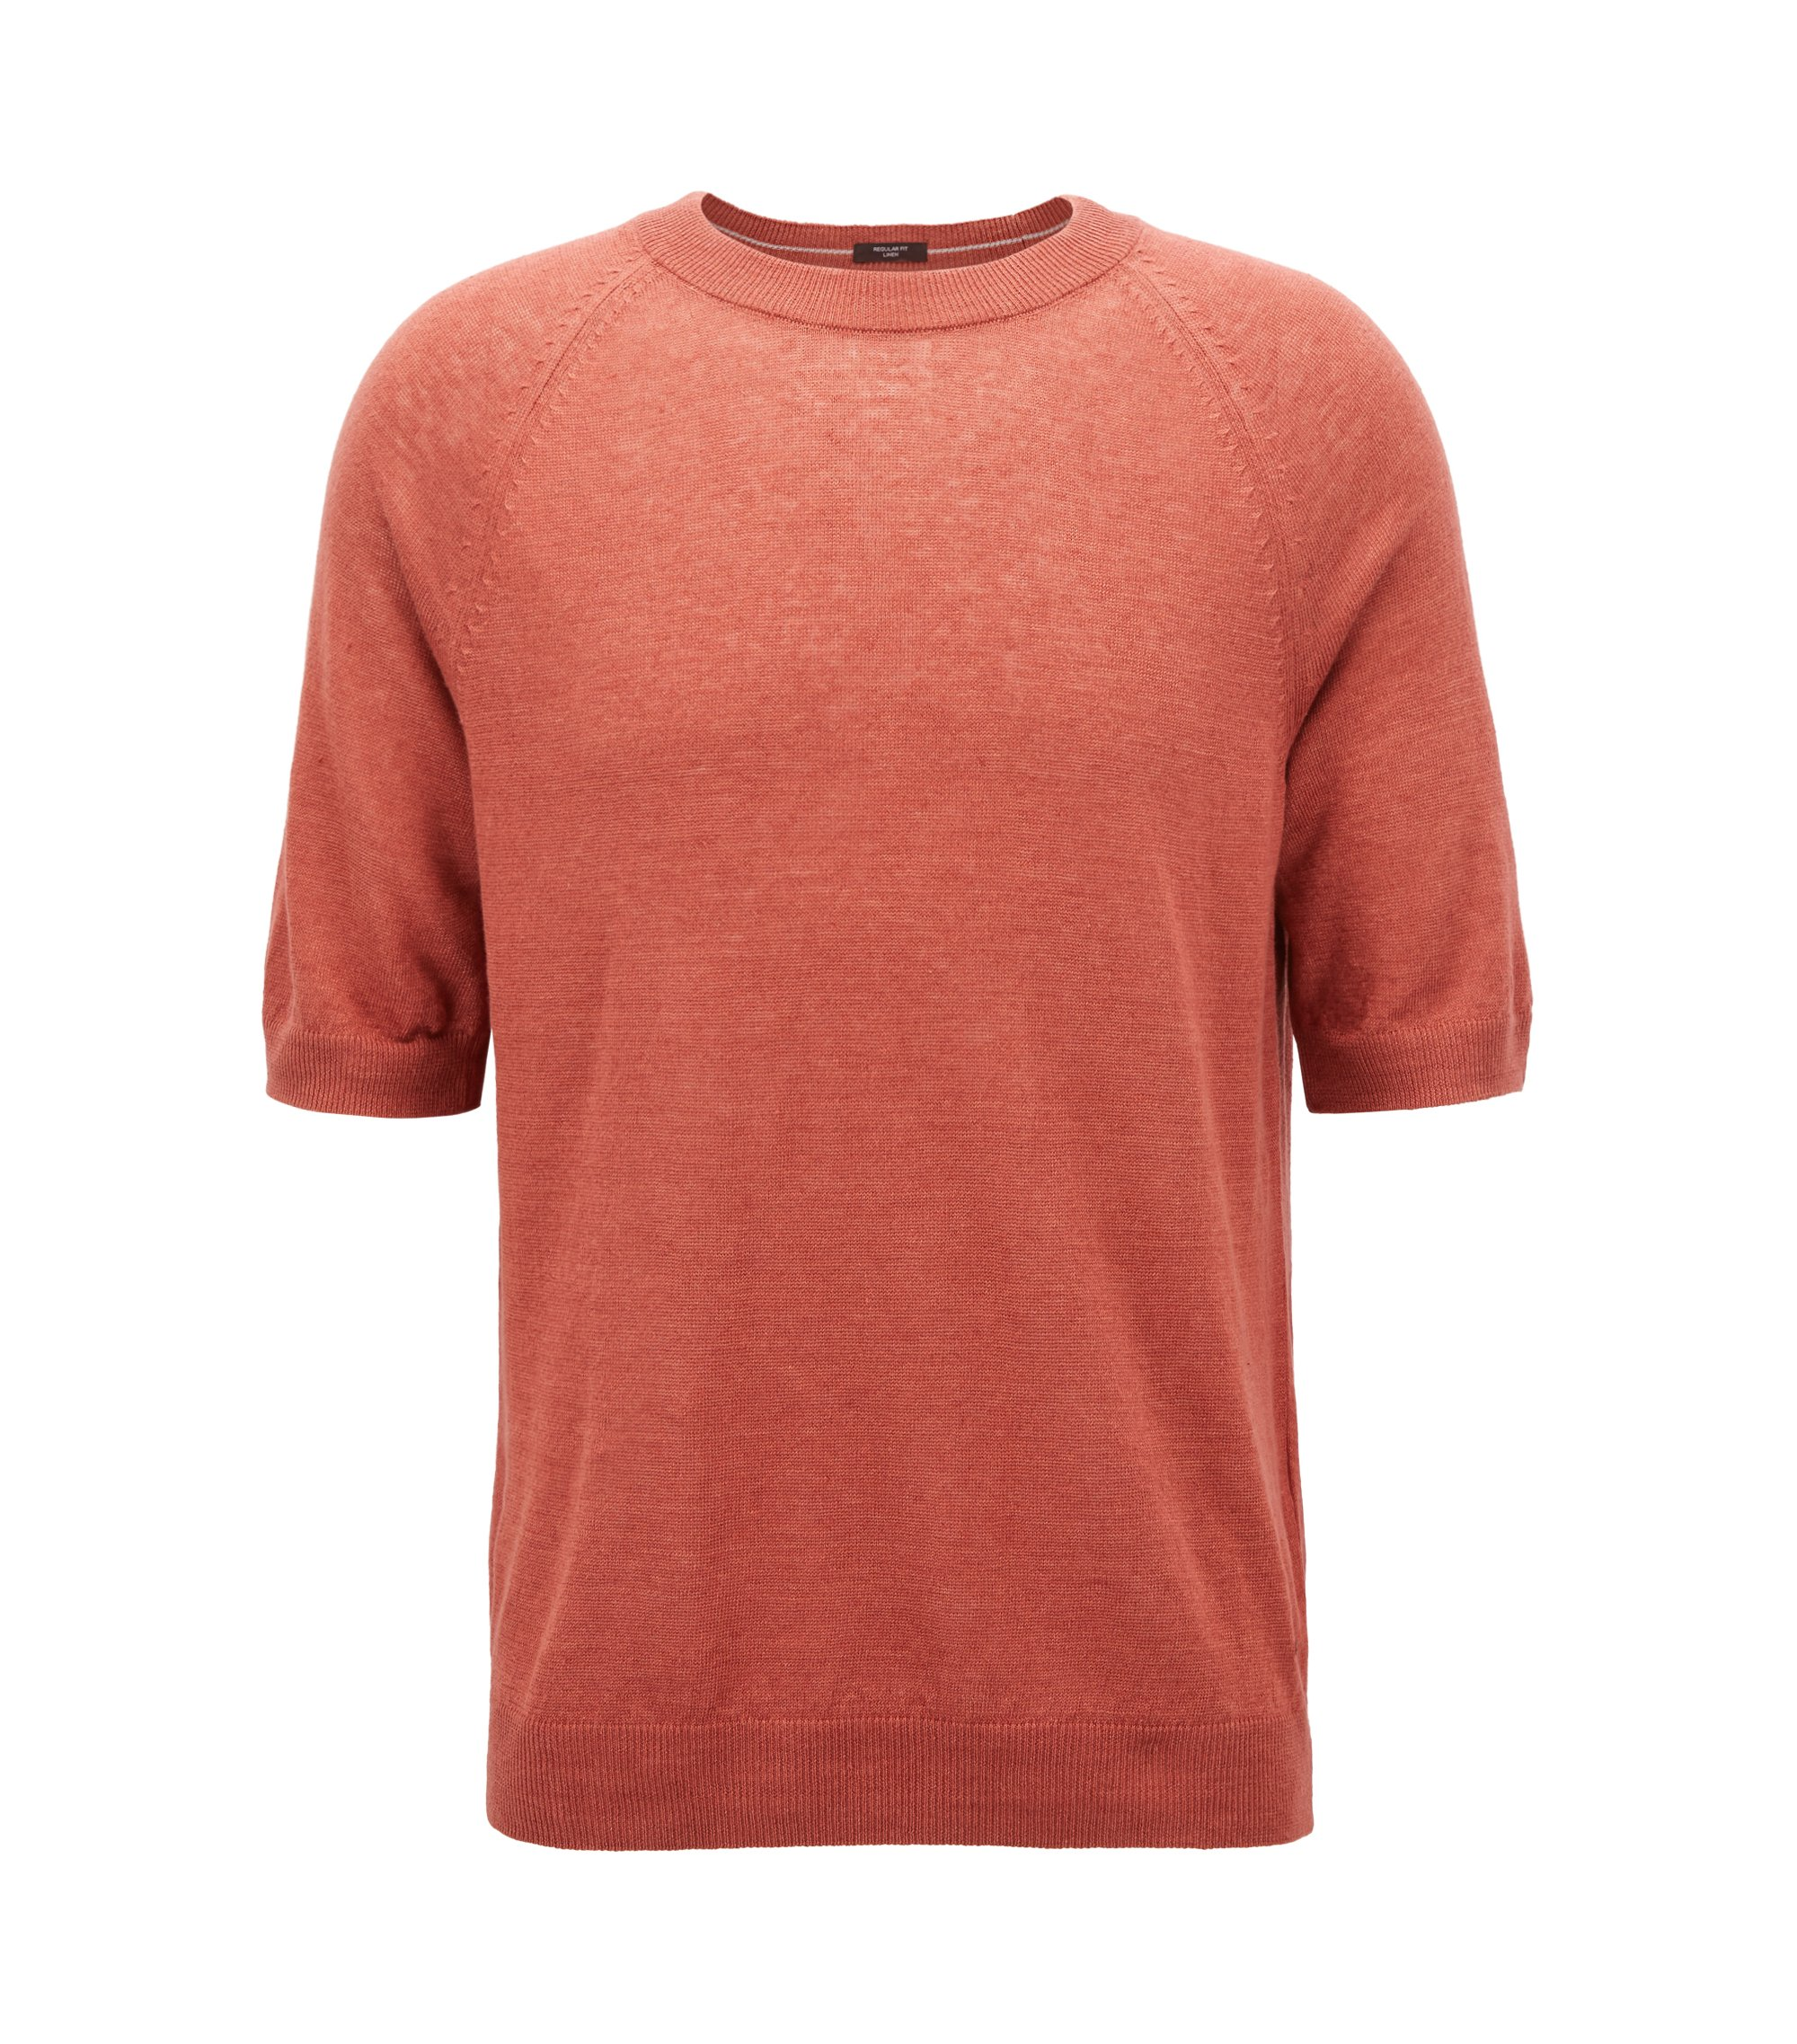 Pull t-shirt en jersey de lin, Rouge clair